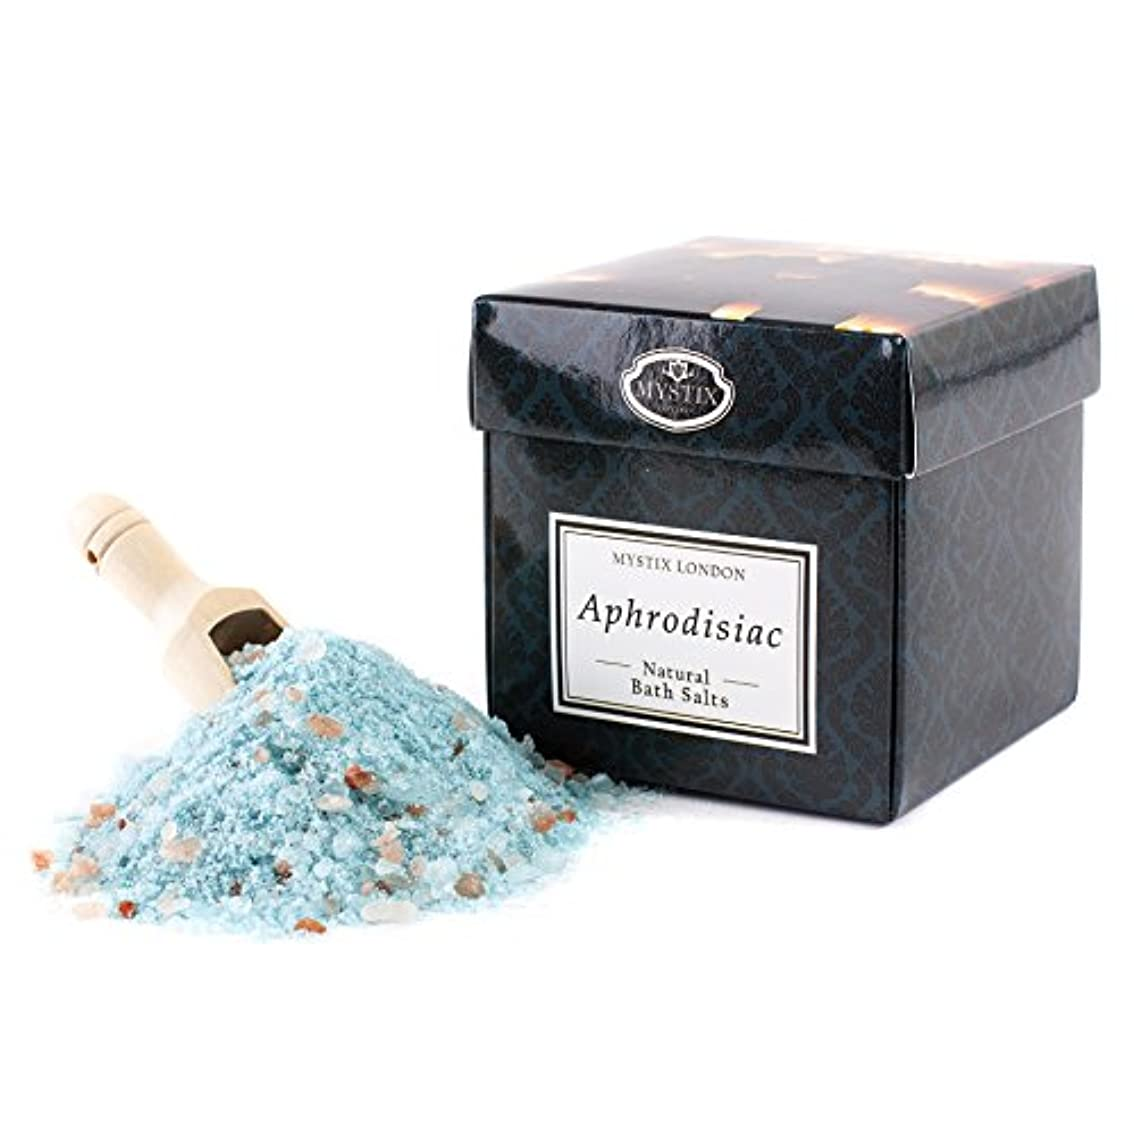 ヒューズ釈義視聴者Mystix London | Aphrodisiac Bath Salt - 350g